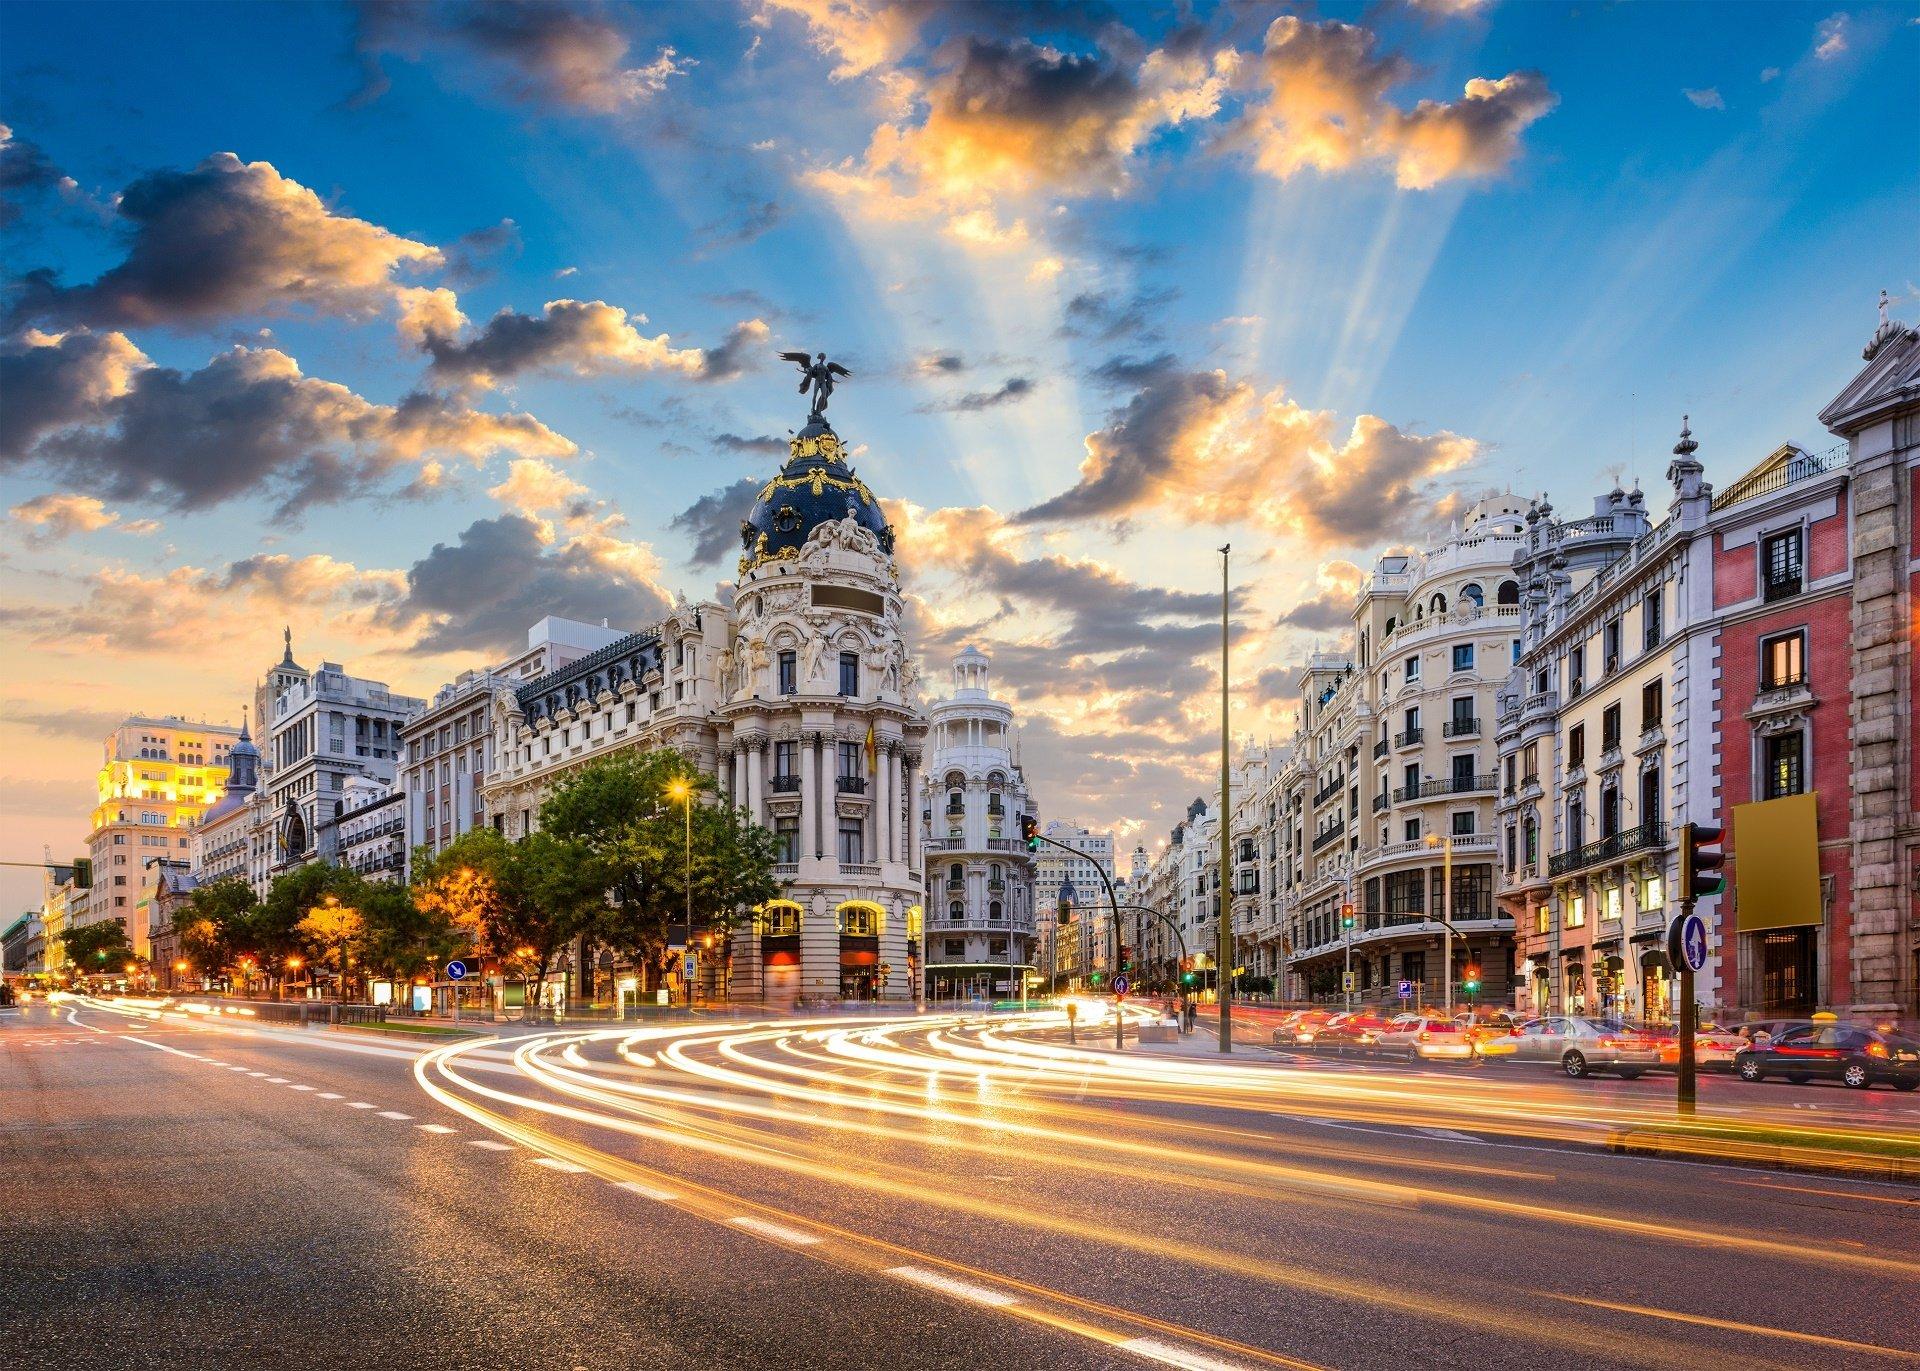 spanien - Europas Största land